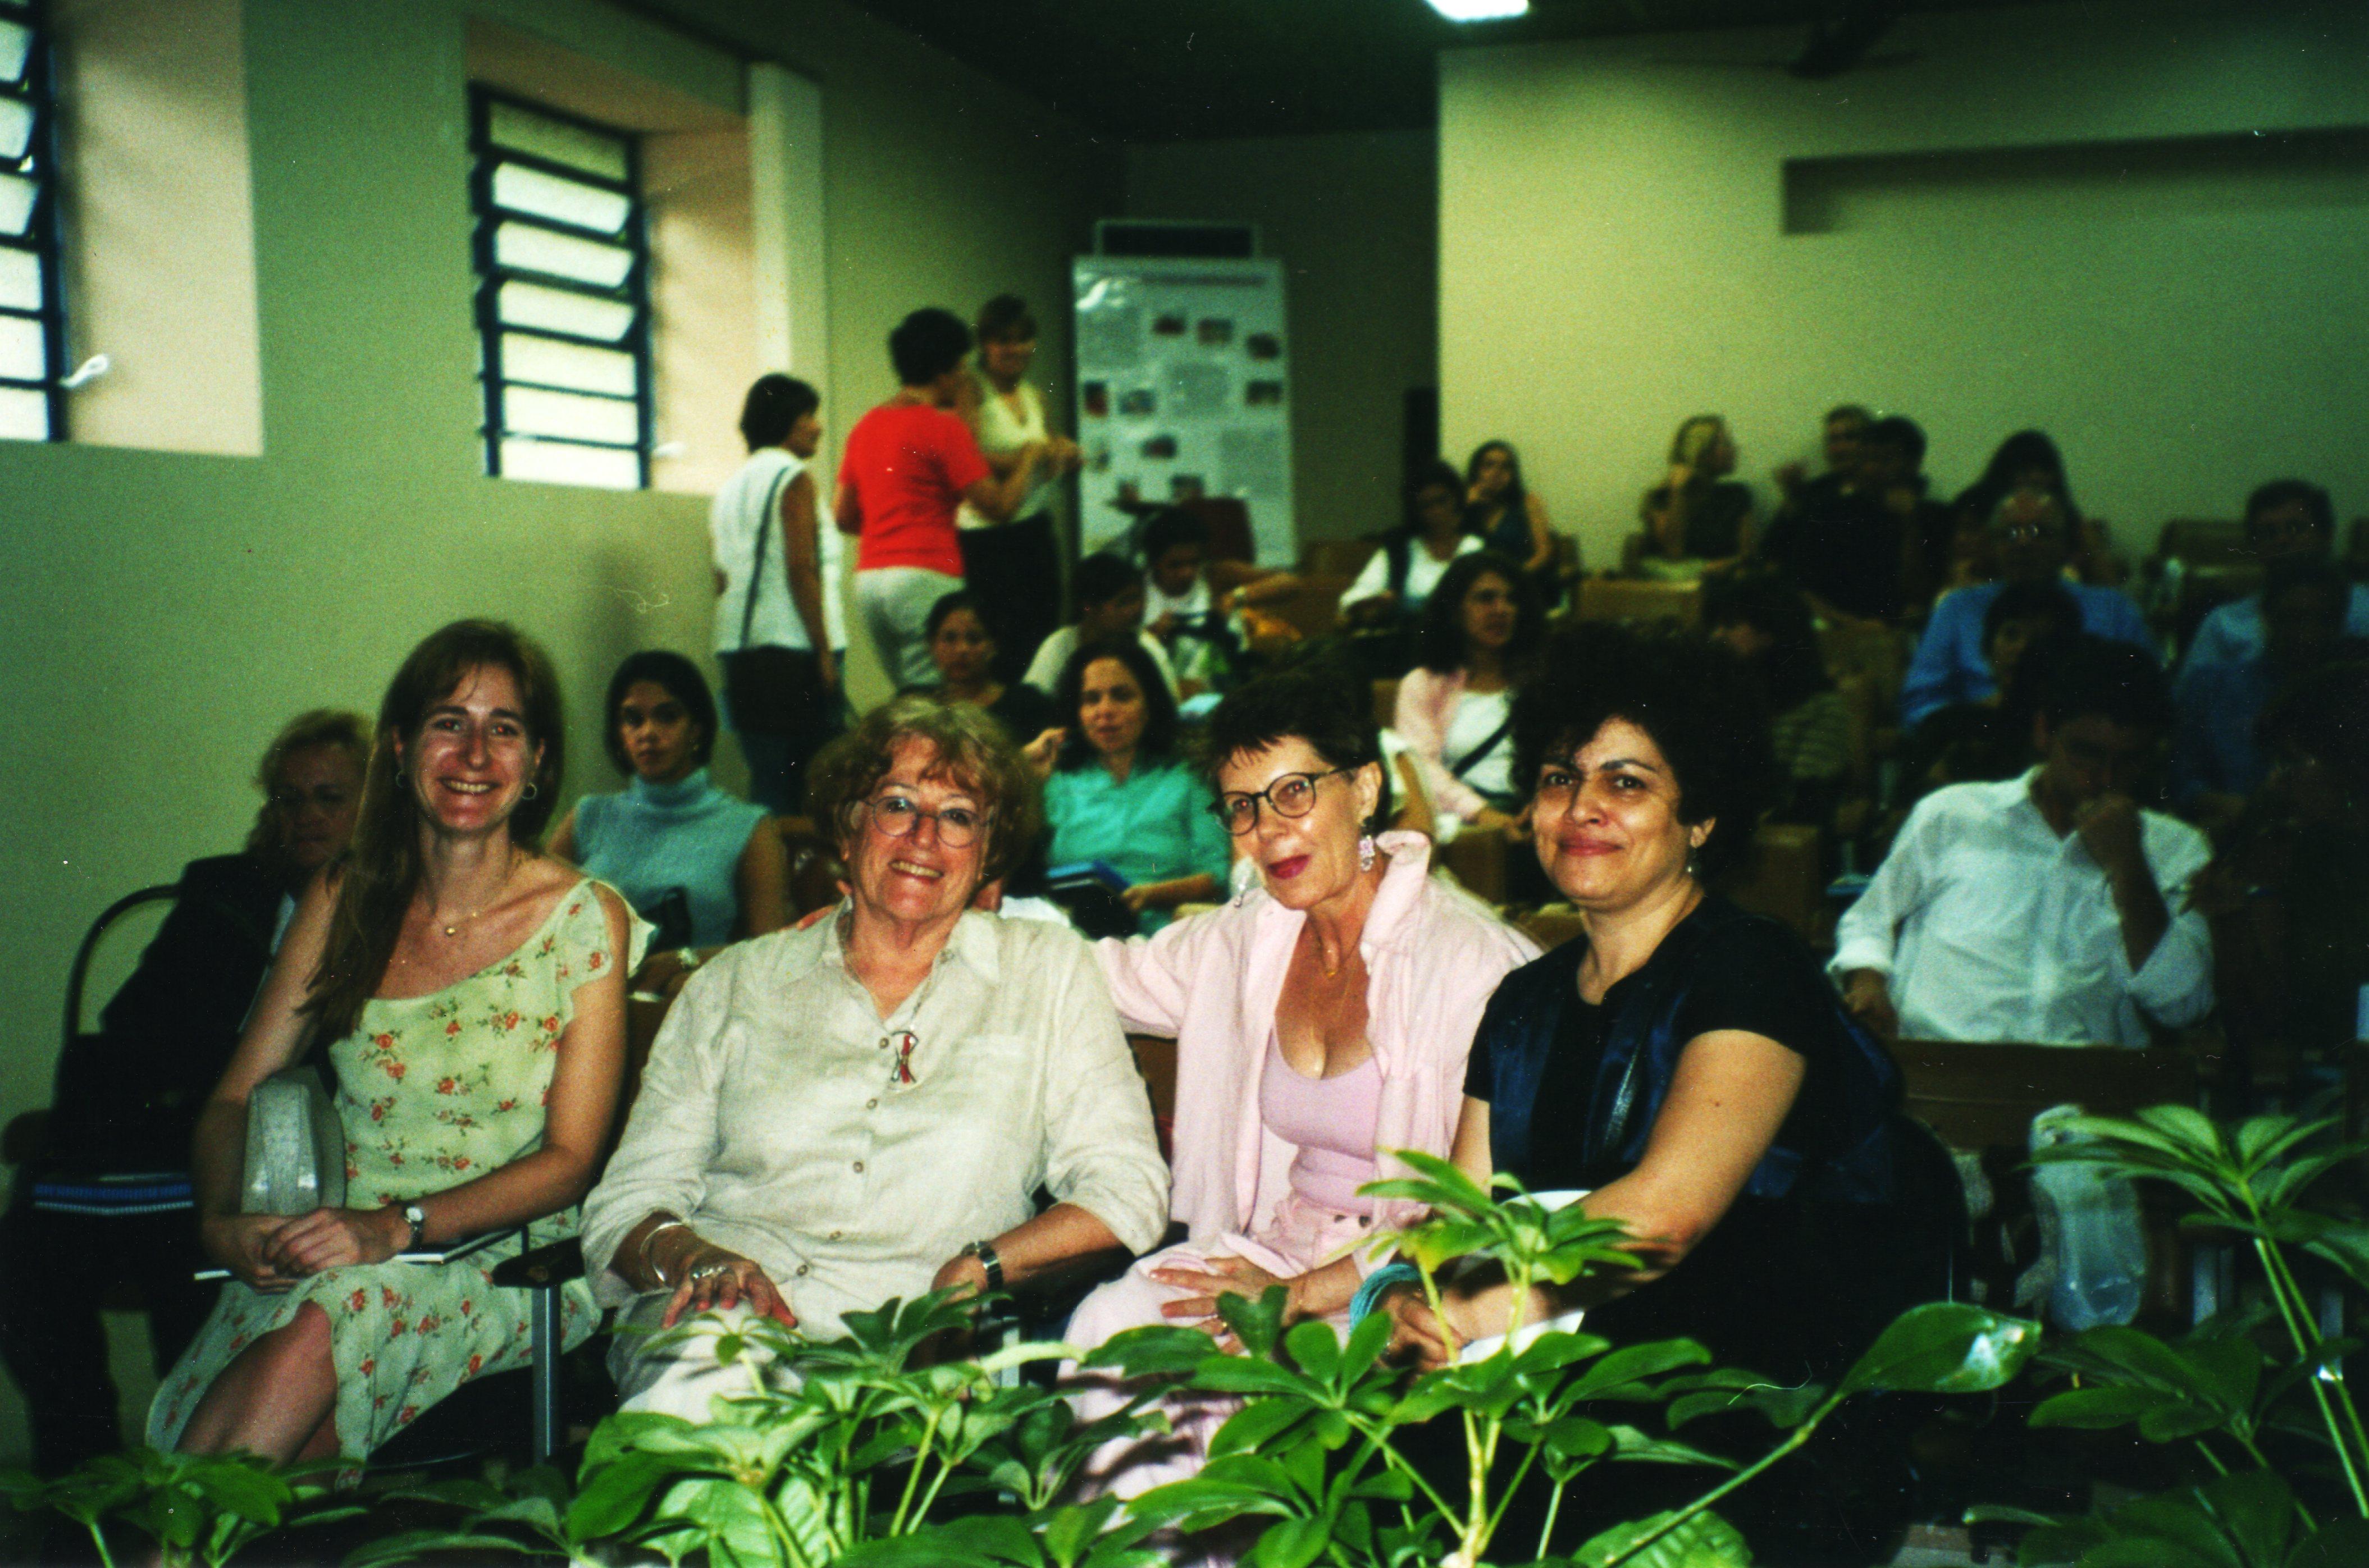 Laboratório Saúde Mental e Psicologia Clínica Social 20 anos 013